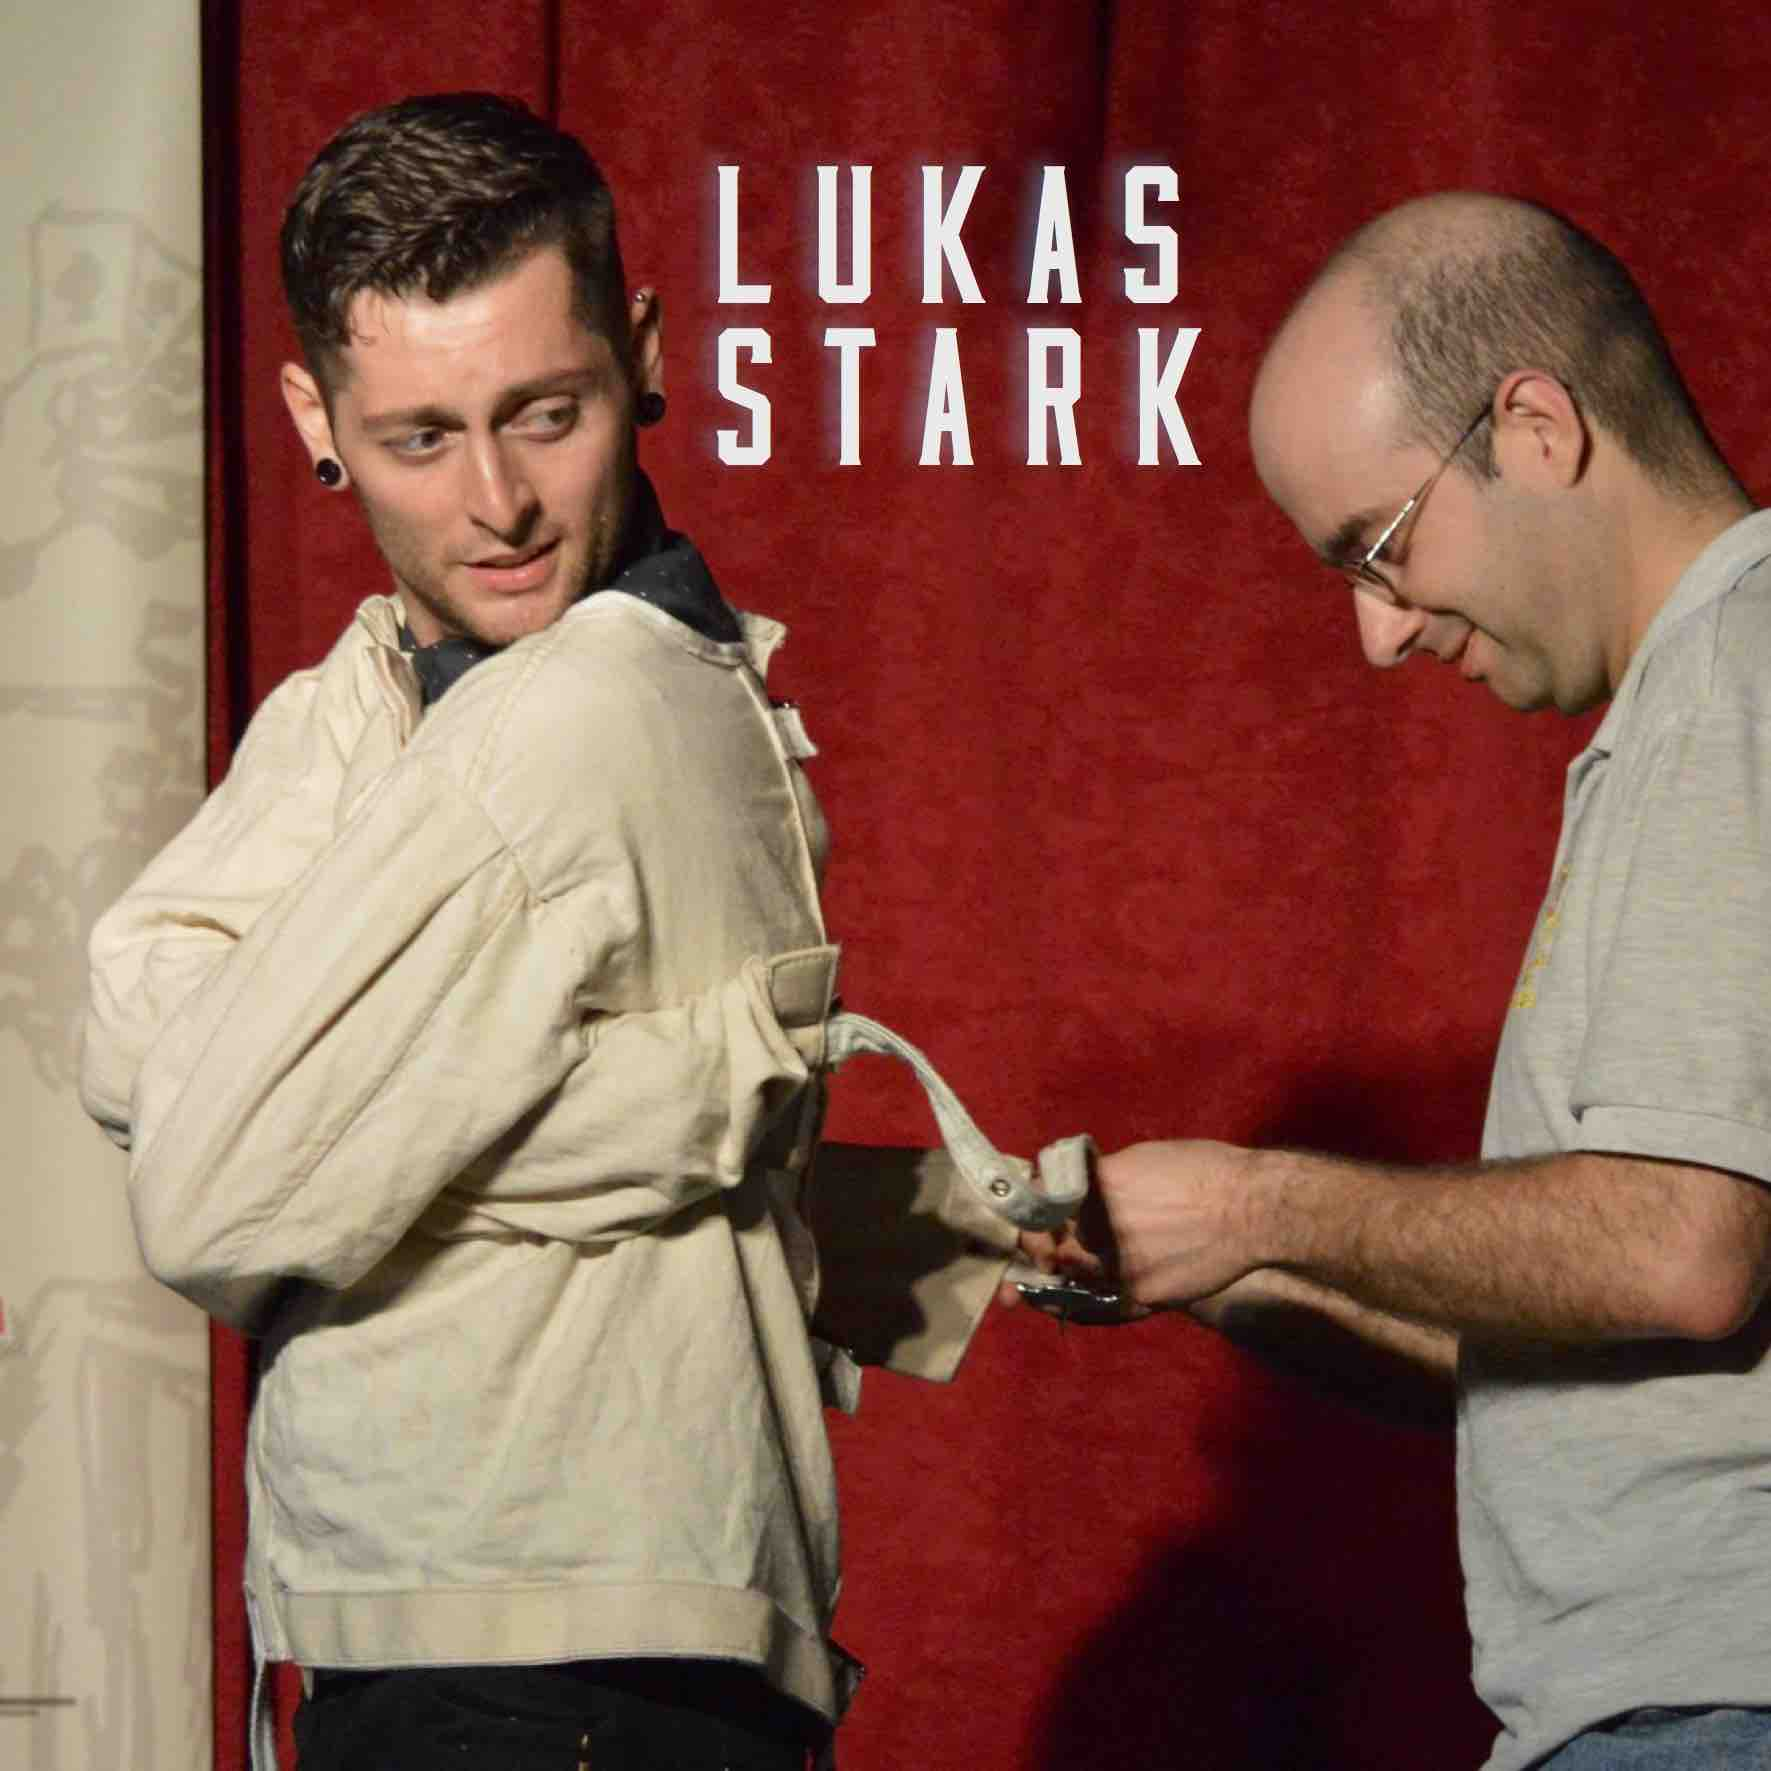 Stark-Lukas.jpg